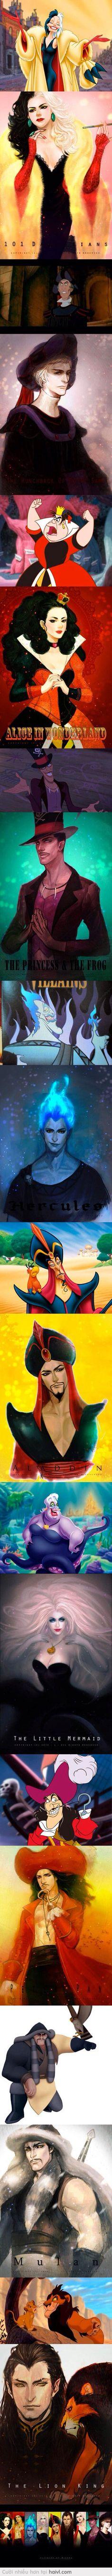 Villian Characters - Disney - Anime